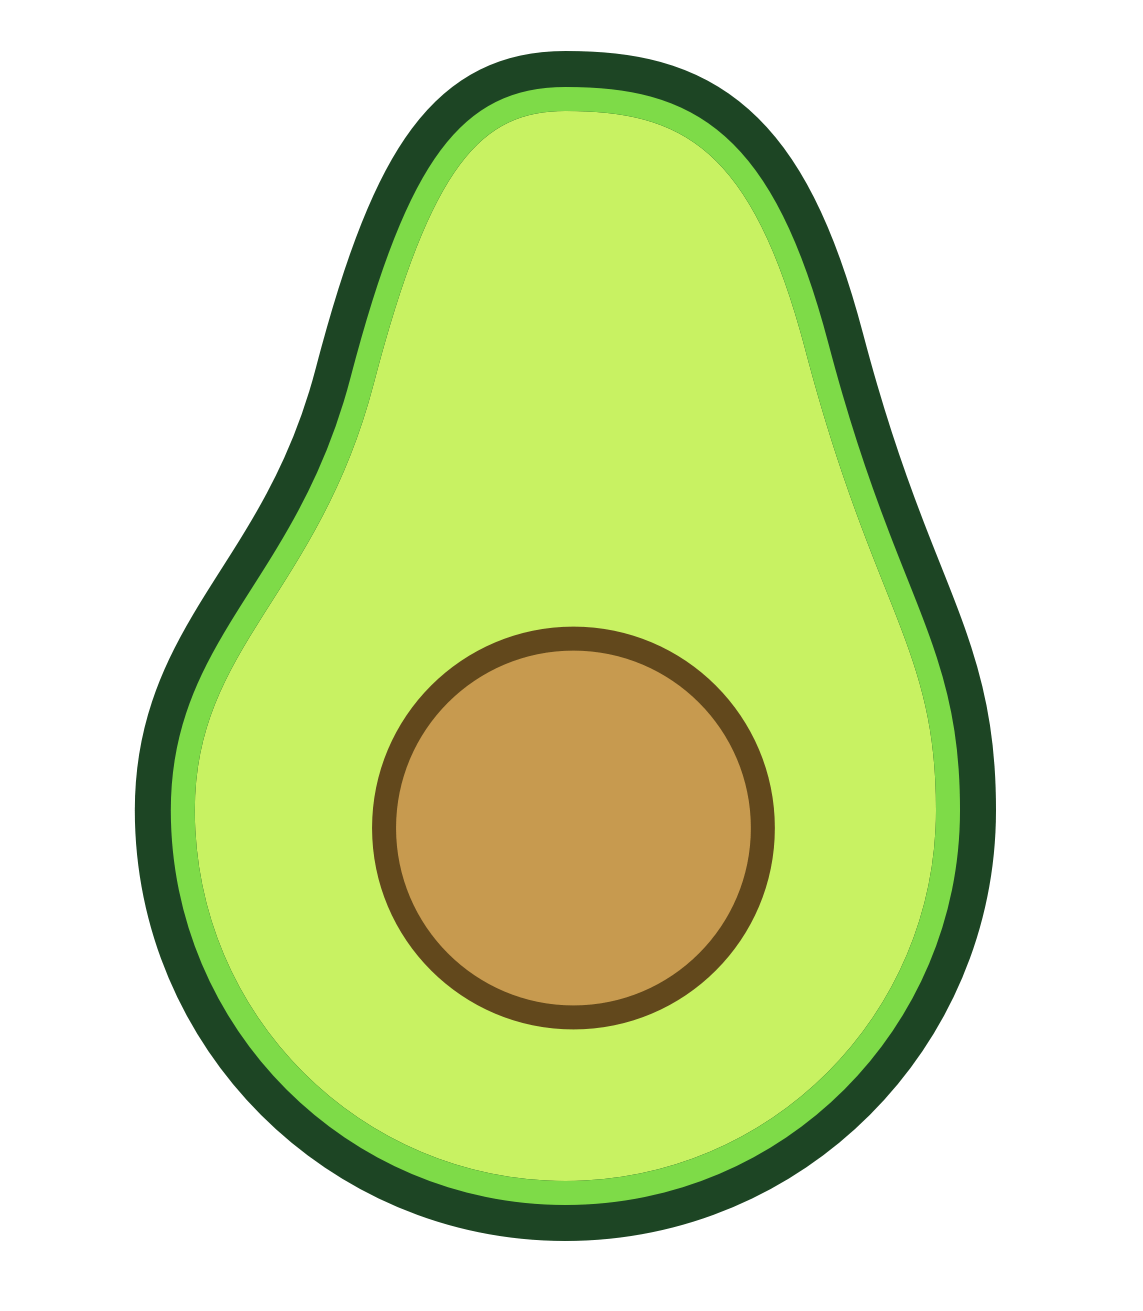 Mango clipart seller. Image result for avocado